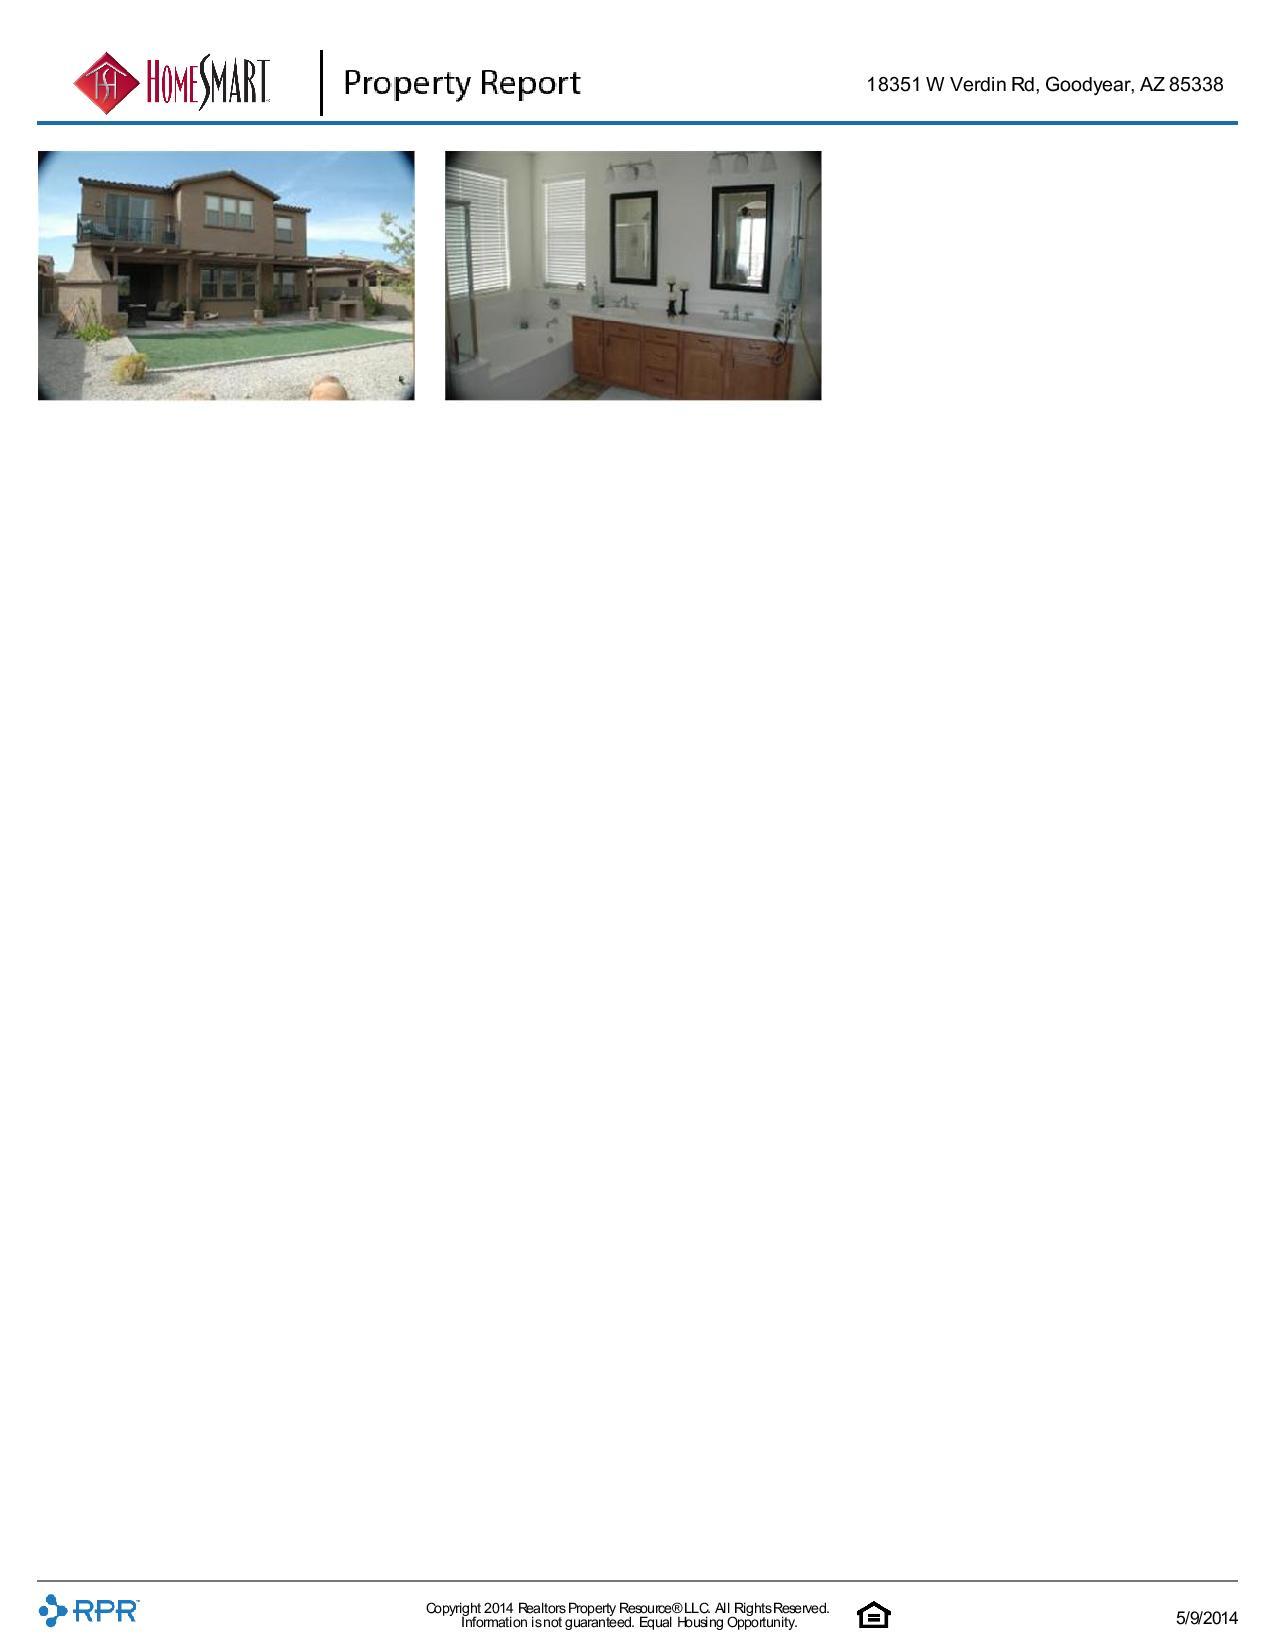 18351-W-Verdin-Rd-Goodyear-AZ-85338-page-008